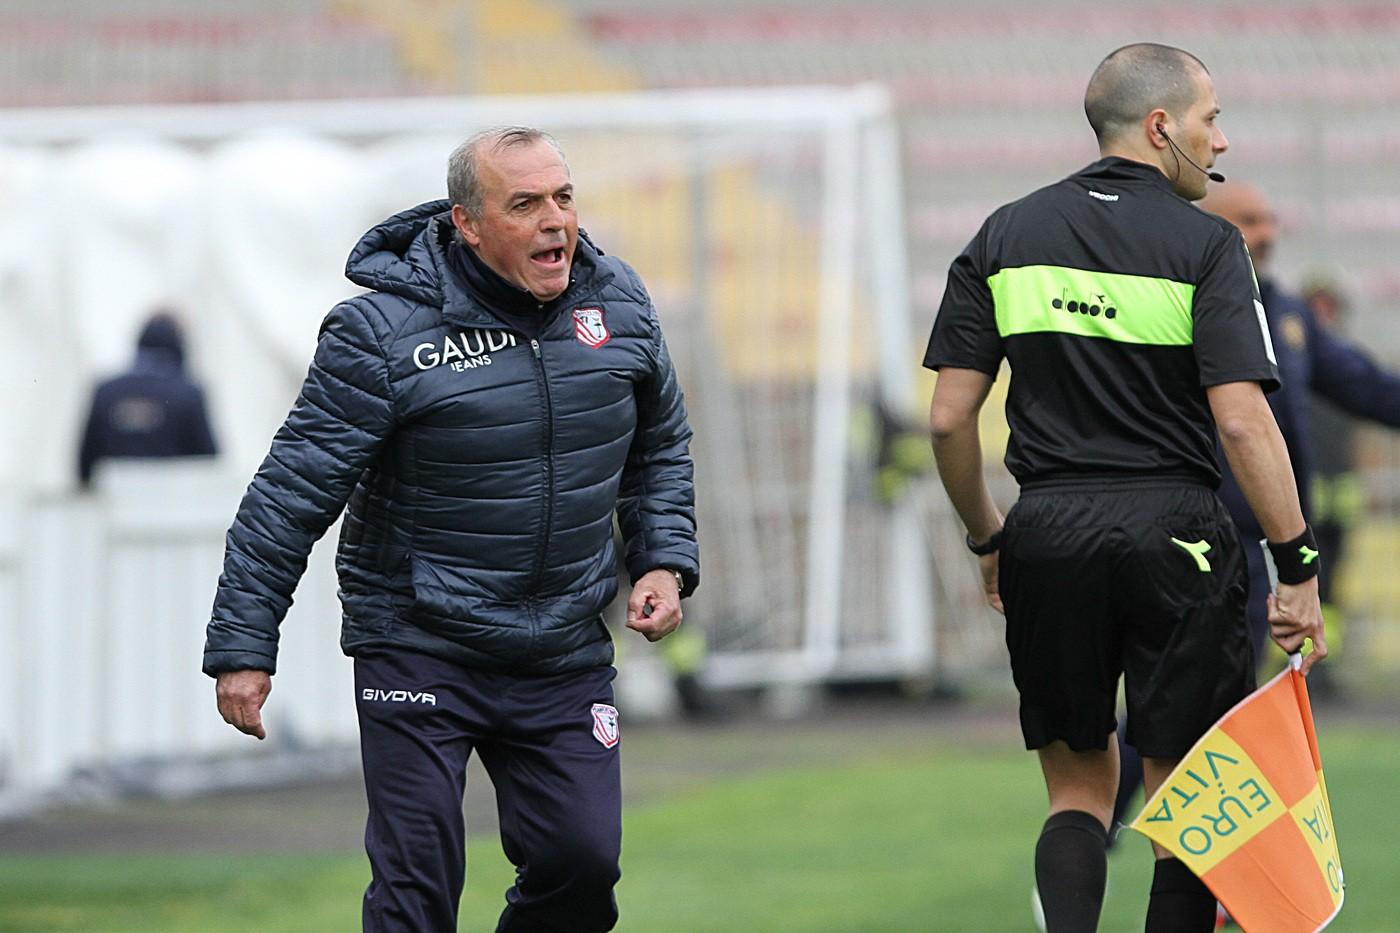 Renato Ingenito/LaPresse